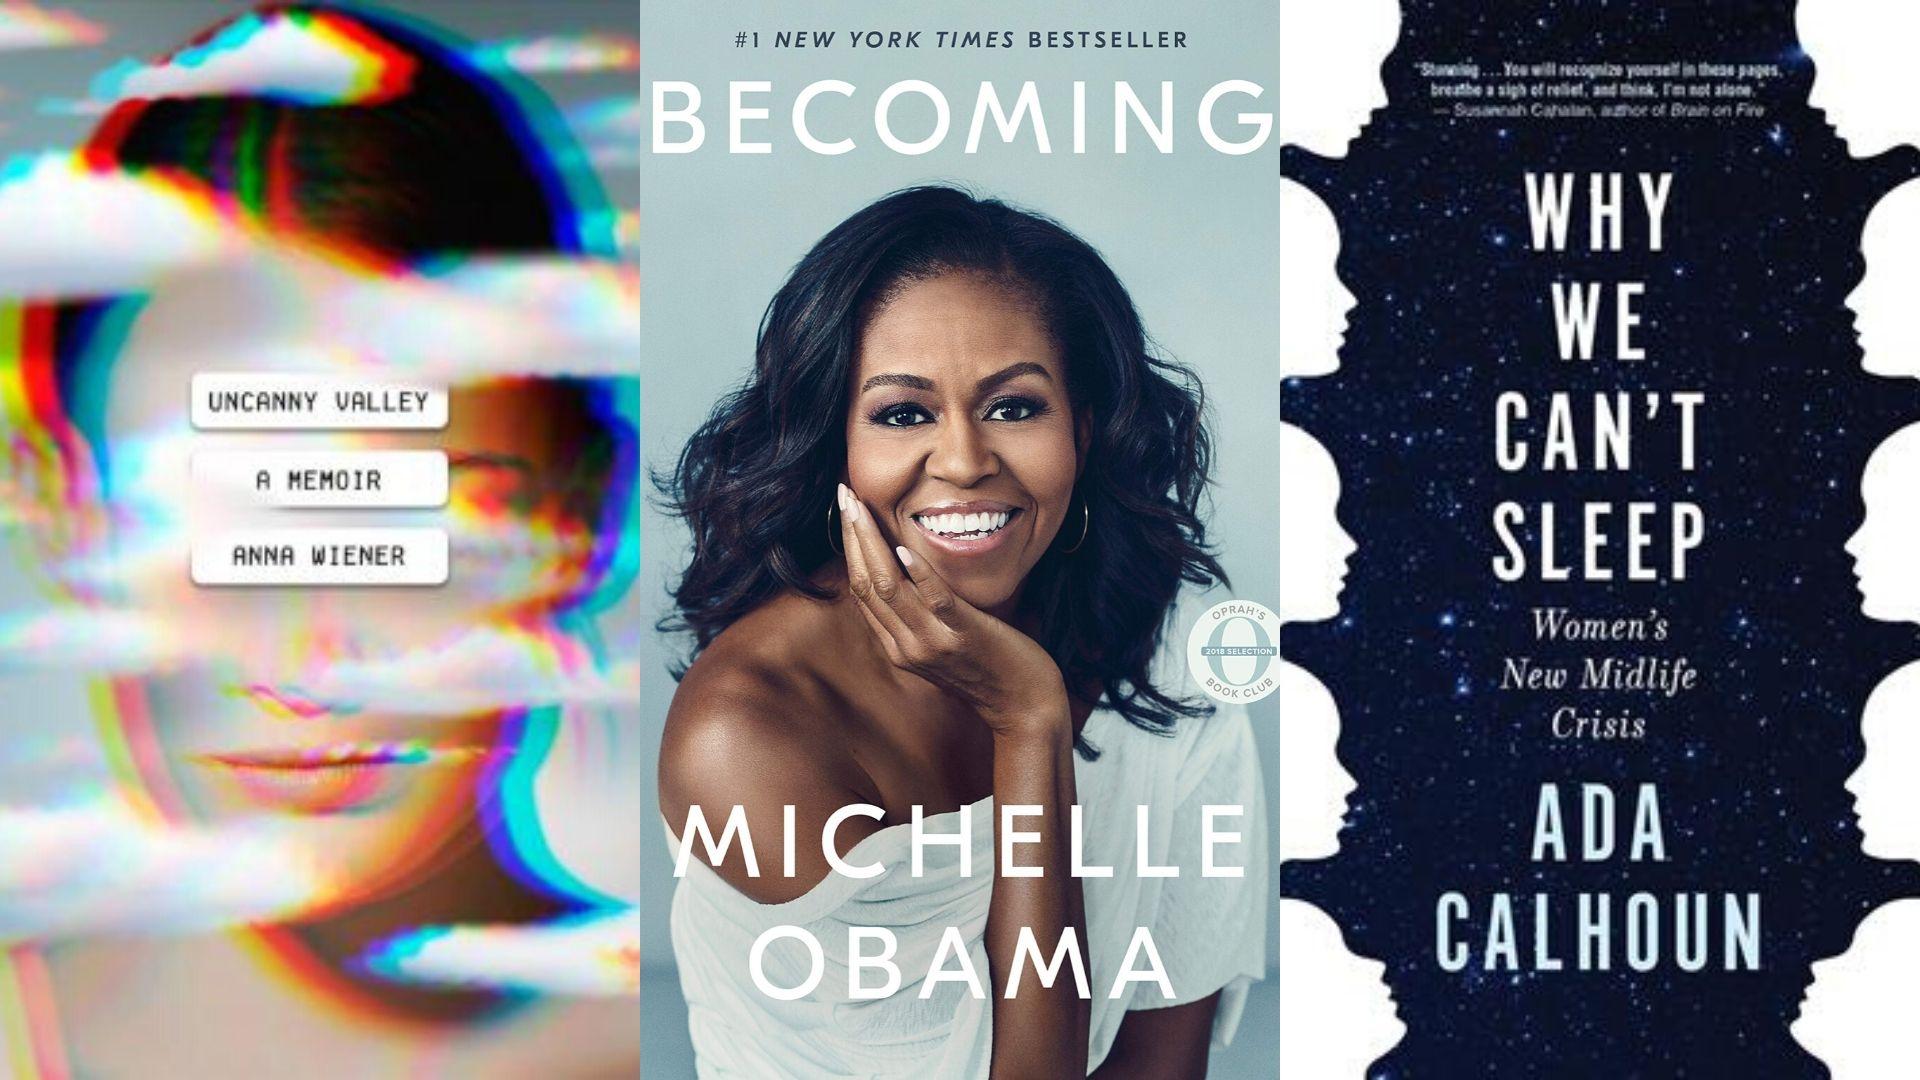 5 New Books To Read During Self-Quarantine